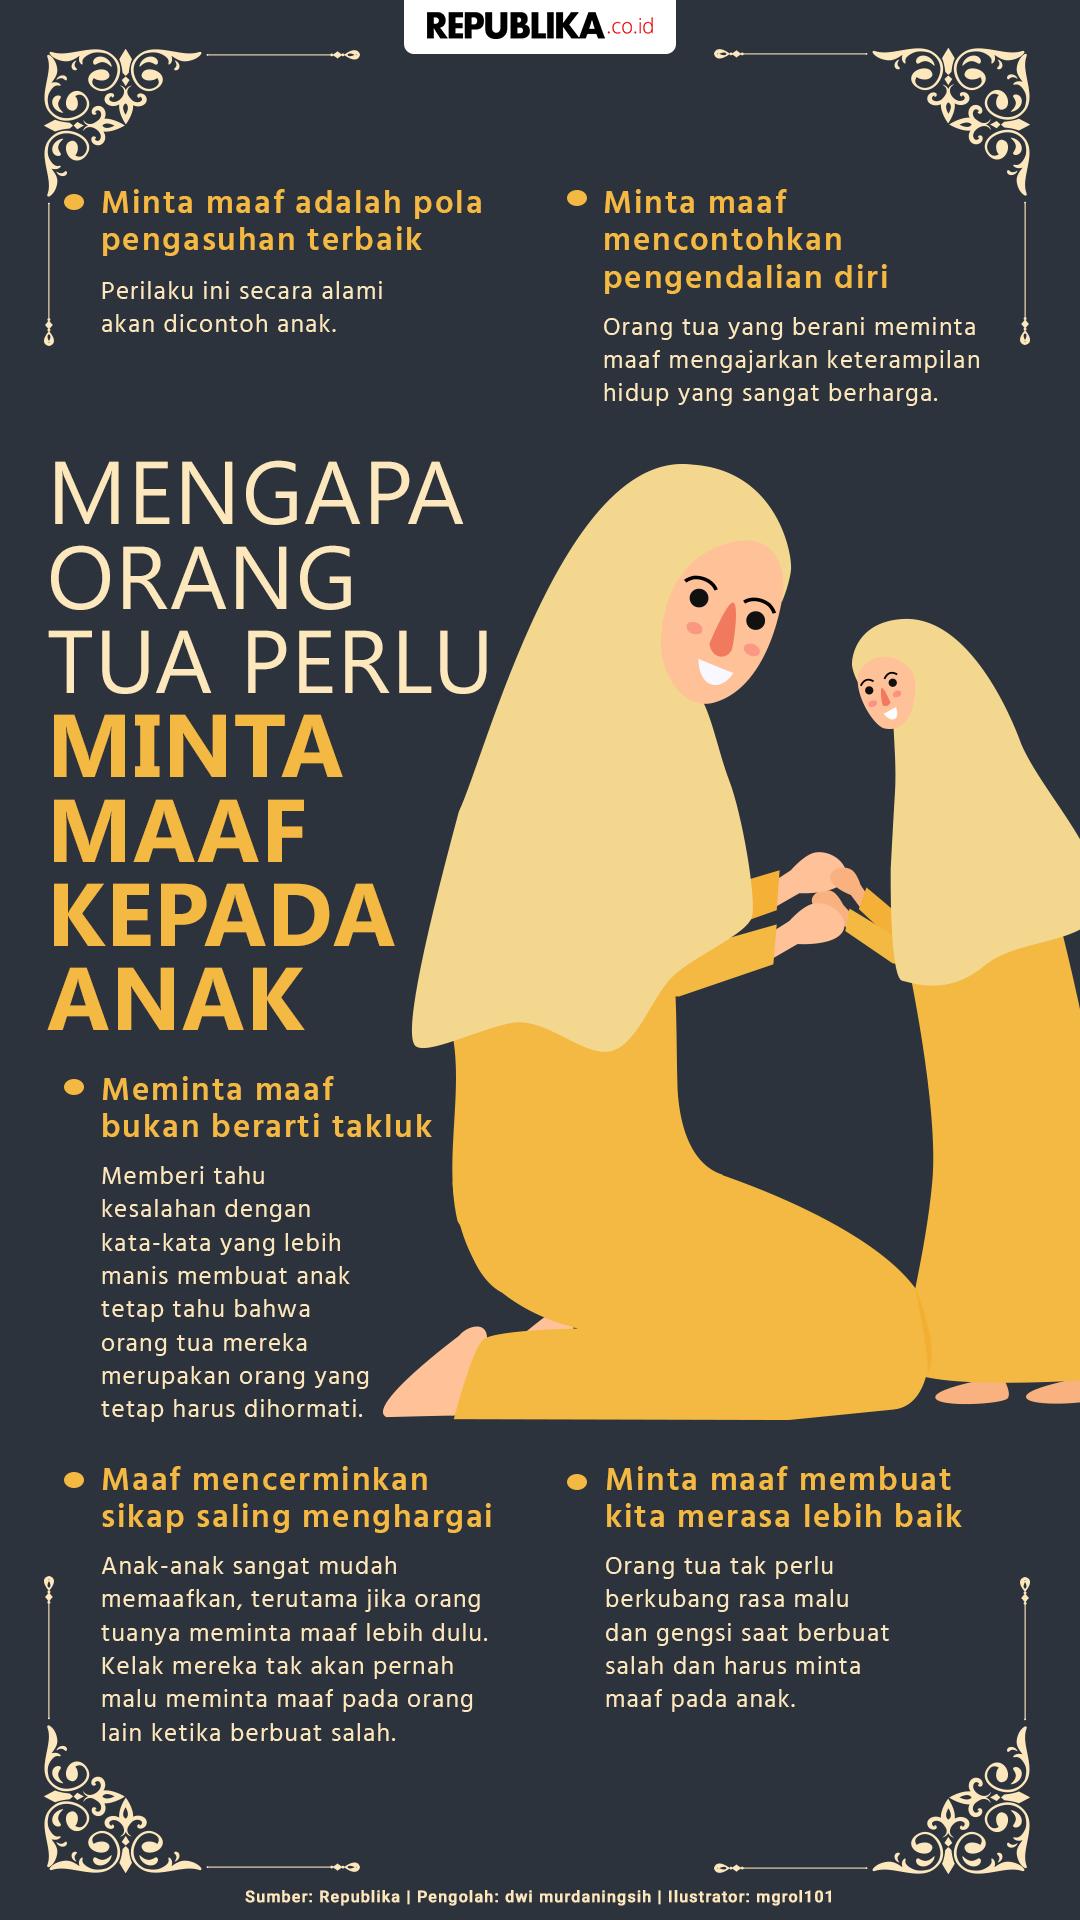 Kata Kata Untuk Orang Tua Naik Haji Kata Kata Untuk Ayah Ibu